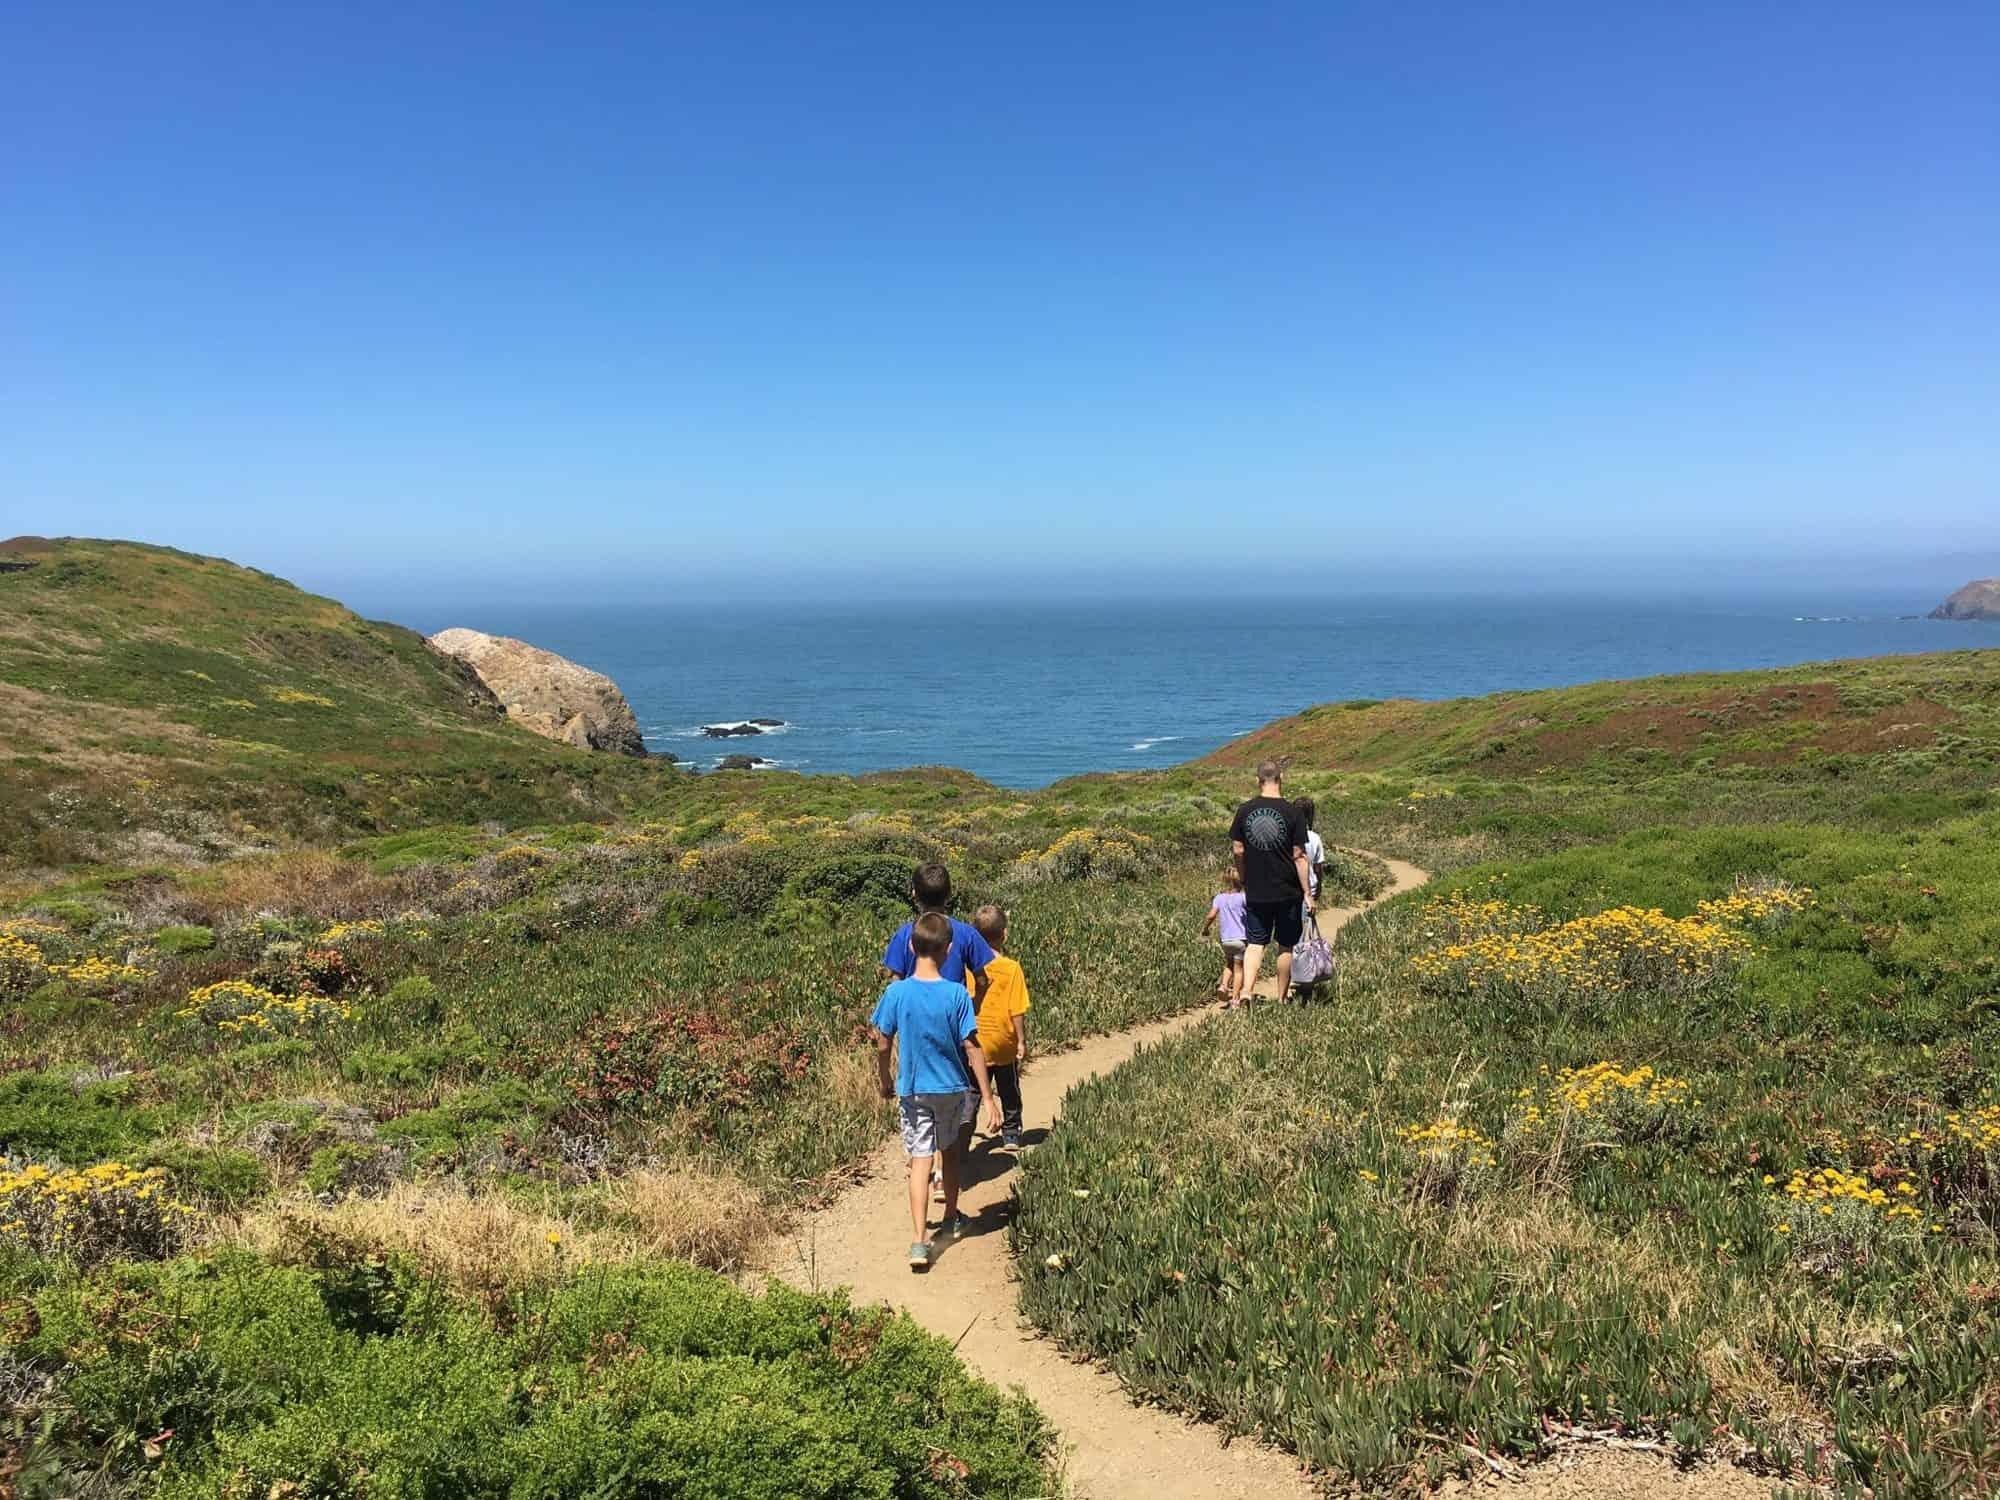 11 National Parks Near San Francisco